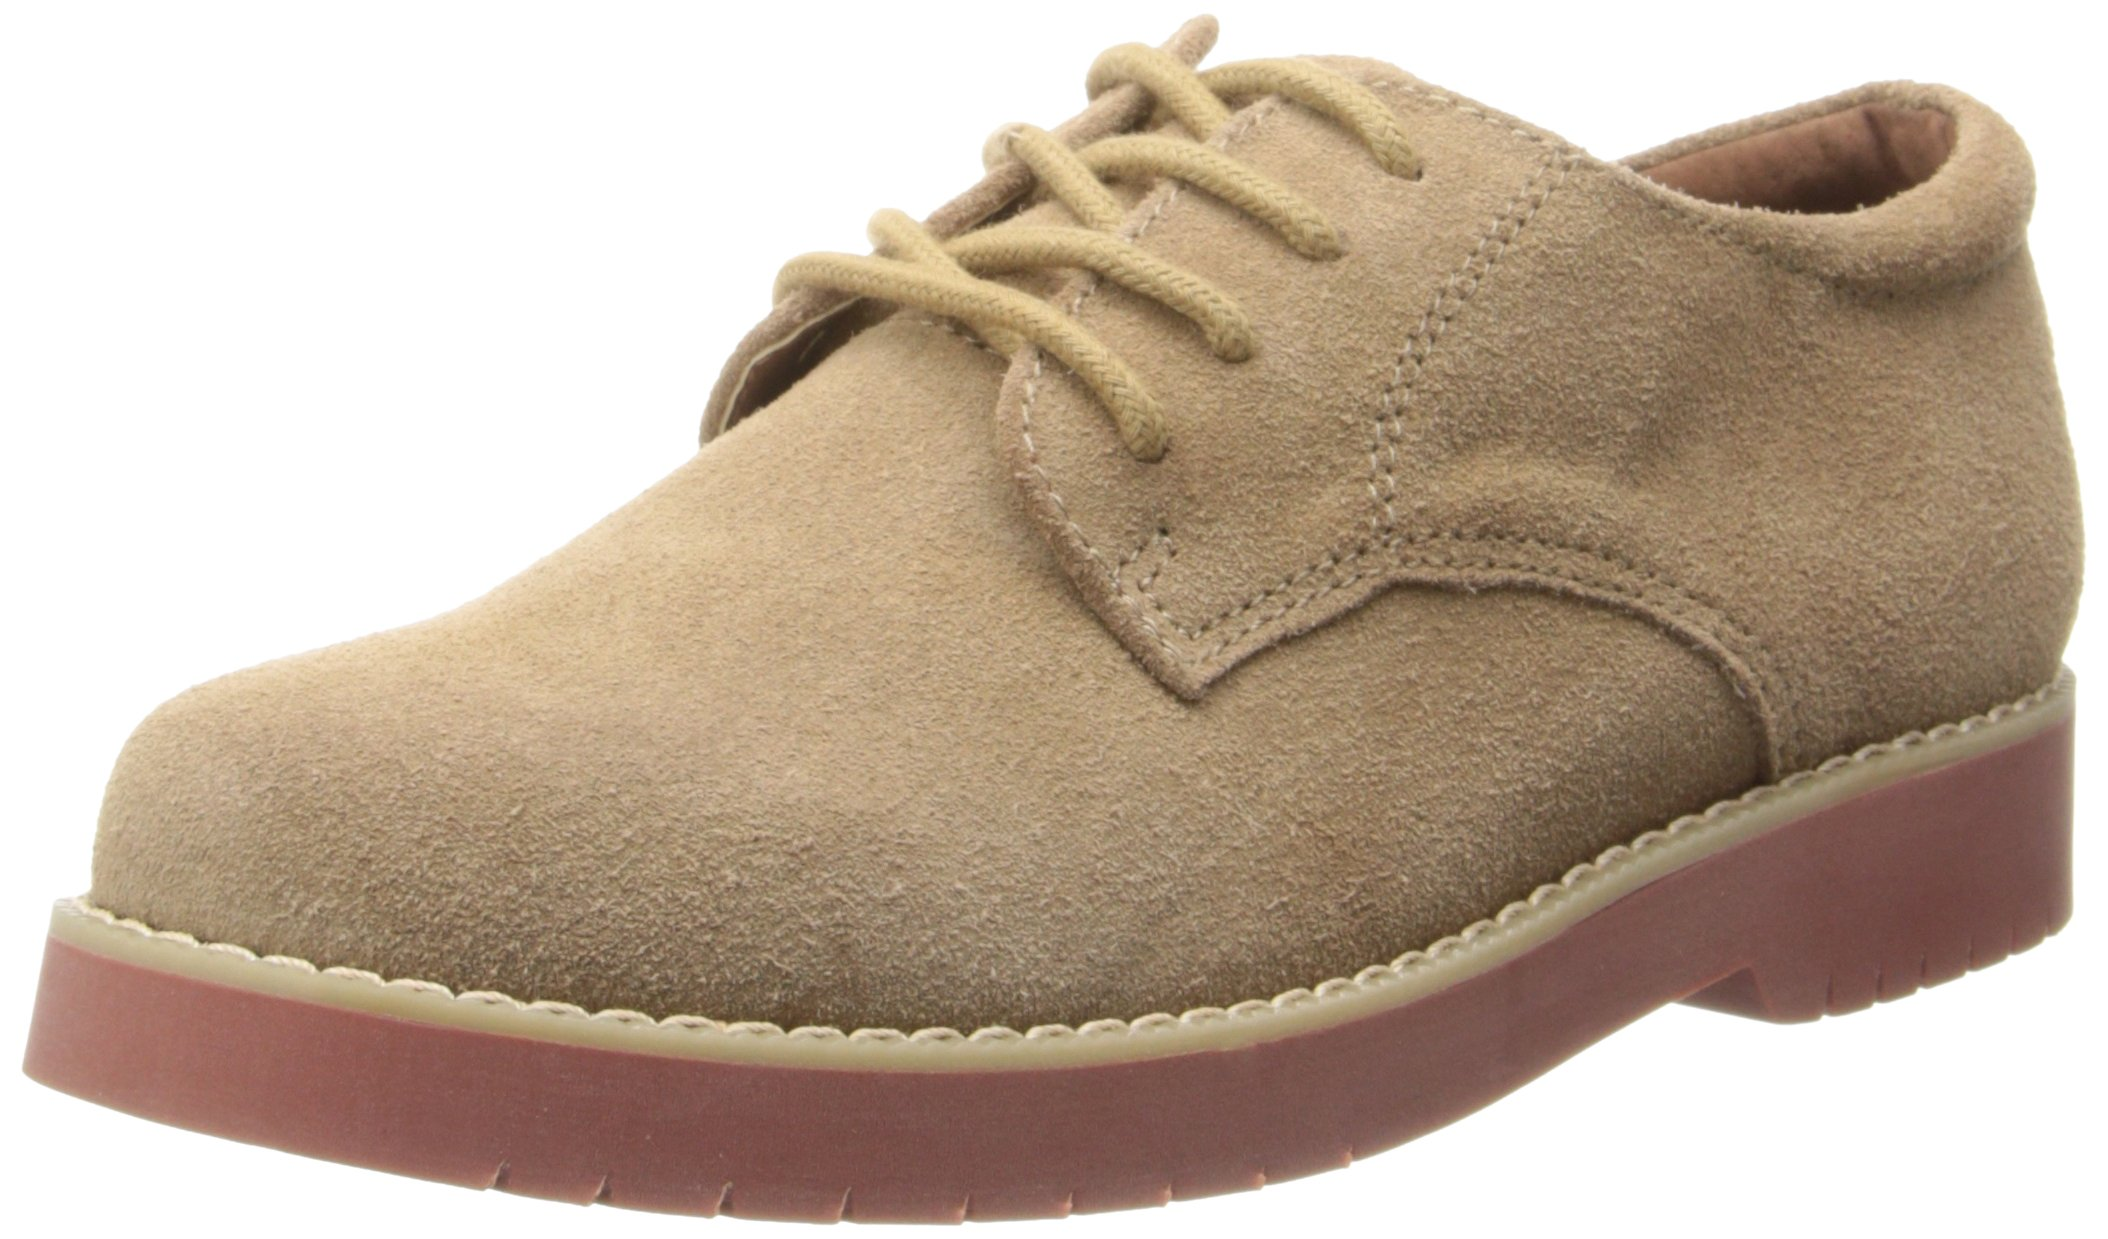 Academie Gear James School Shoe (Toddler/Little Kid/Big Kid),Dirty Buck,3 M US Little Kid